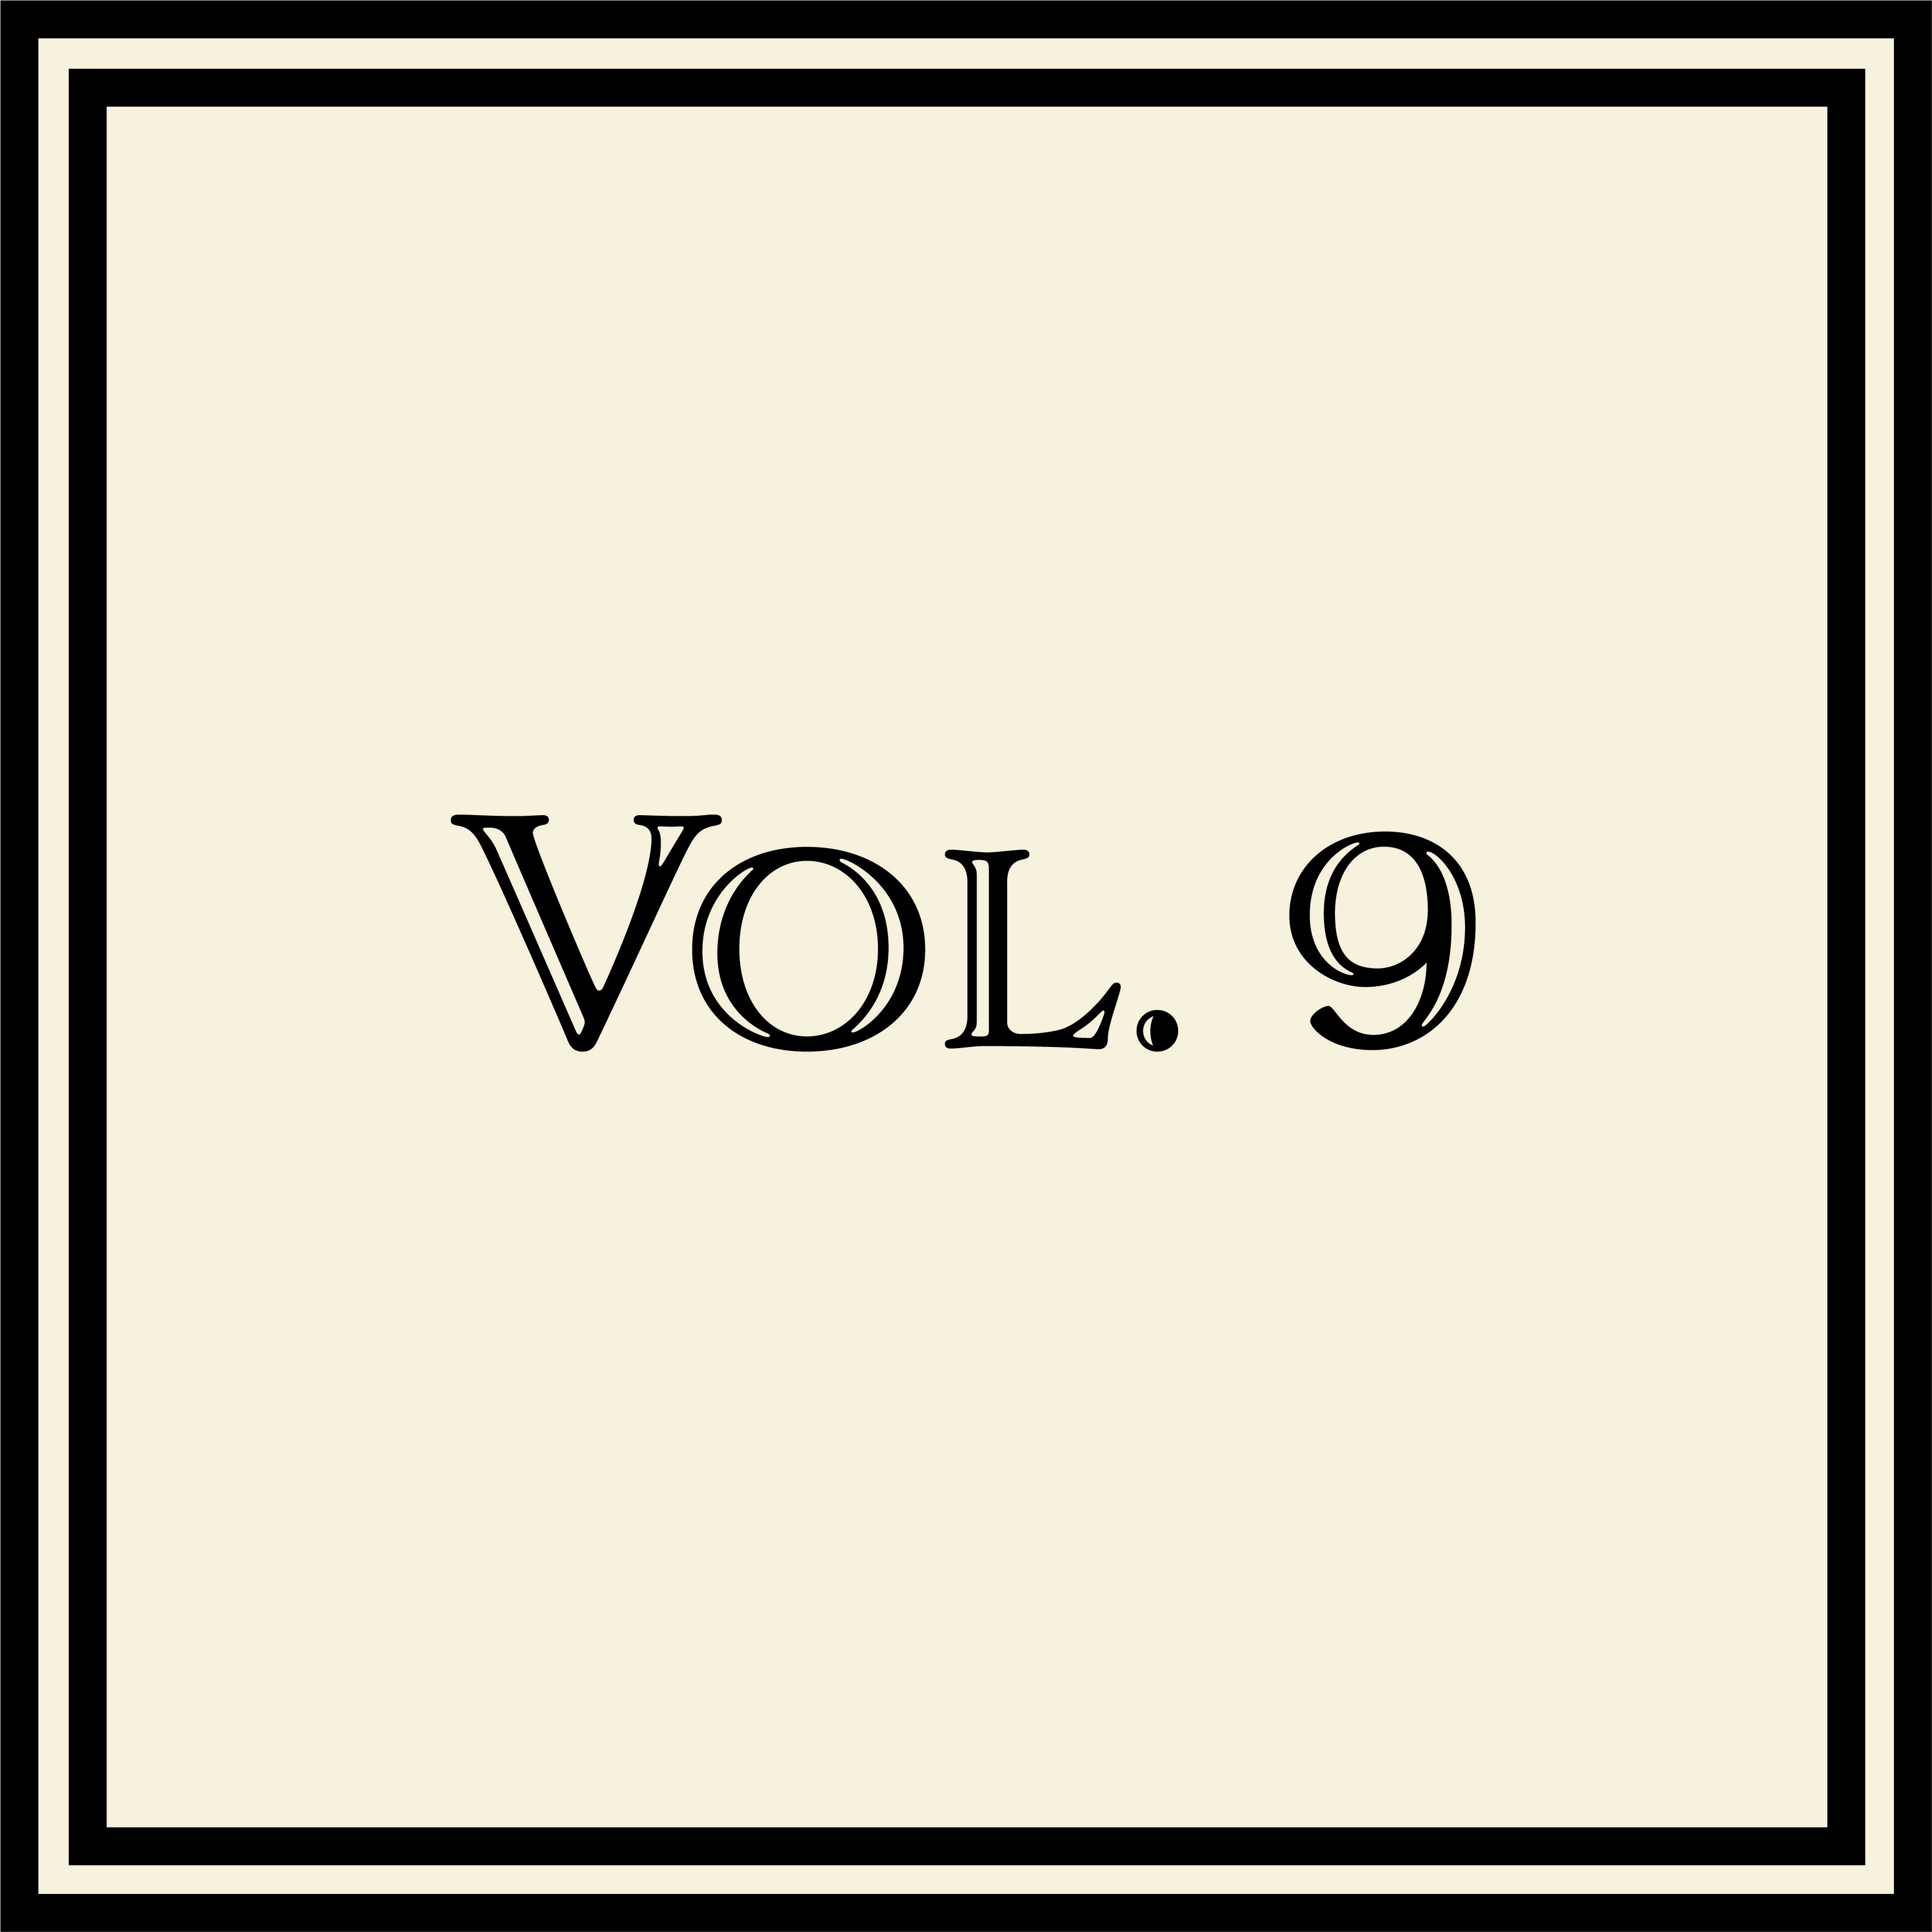 volume9